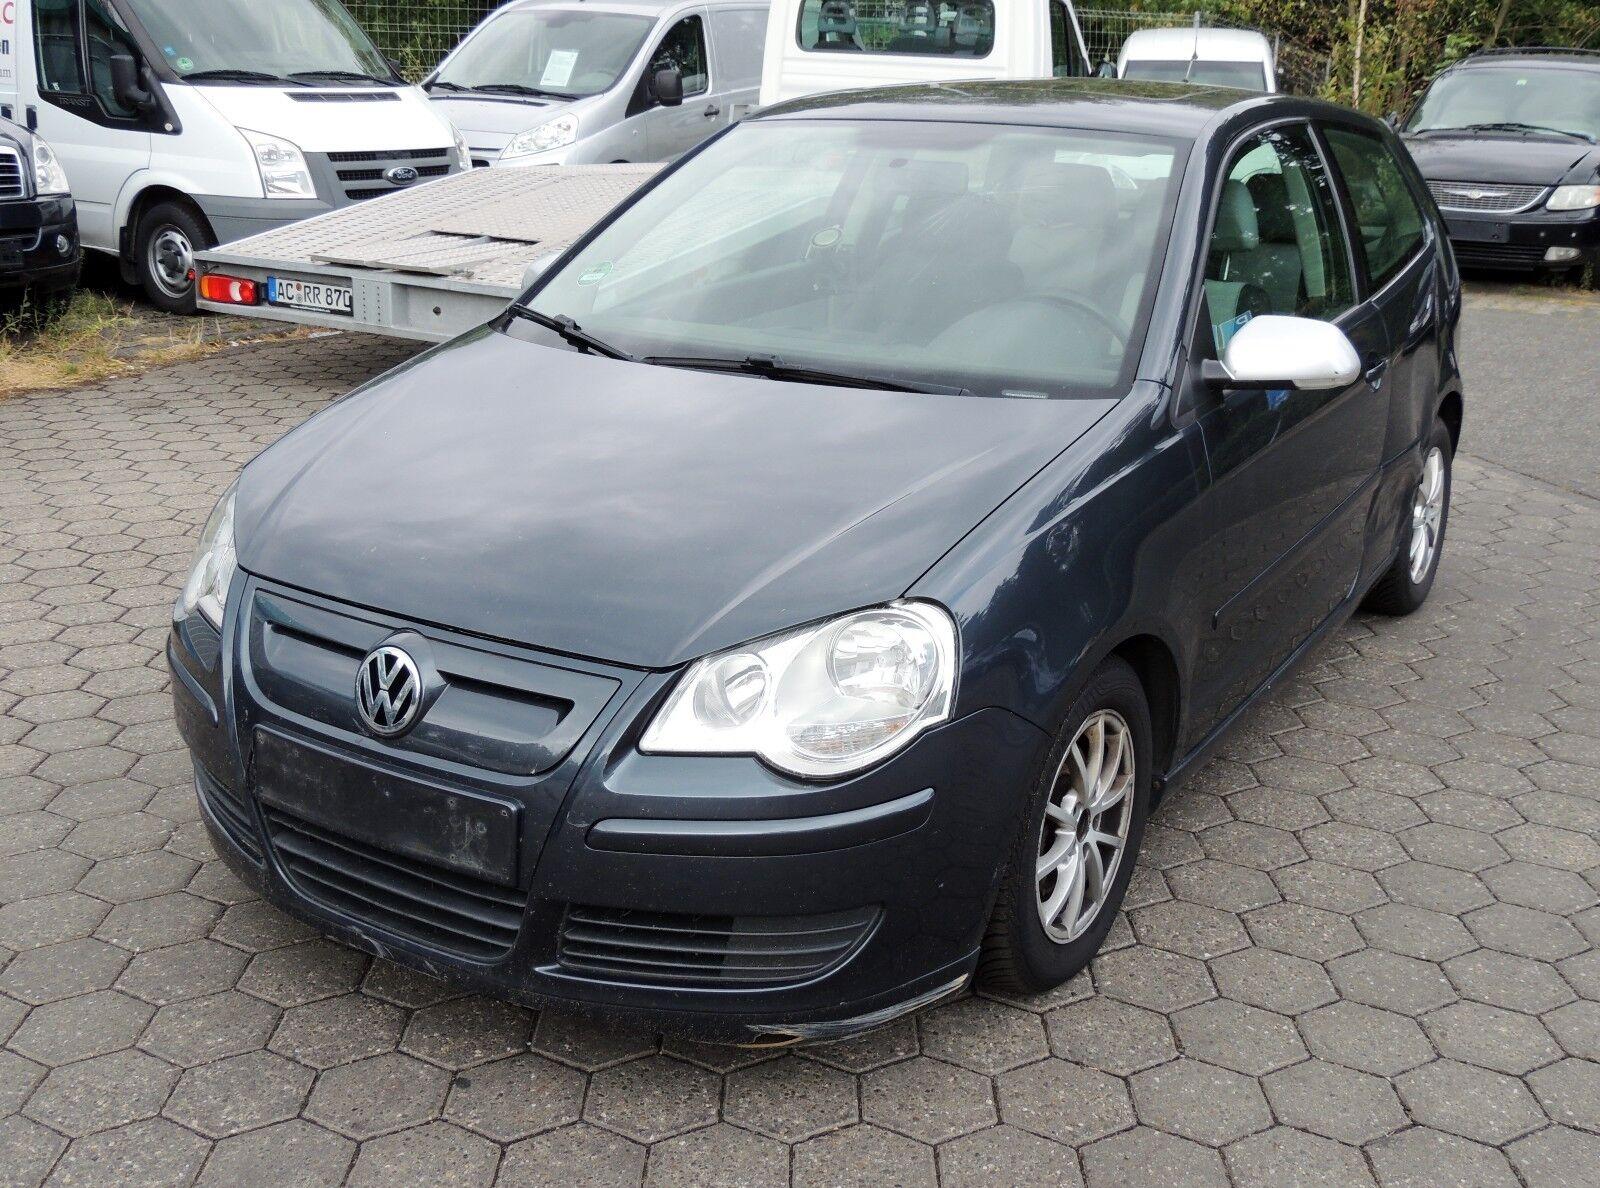 Volkswagen Polo IV BlueMotion 1,4 TDi *Schiebedach*EU4*115Tkm* Ab 1€